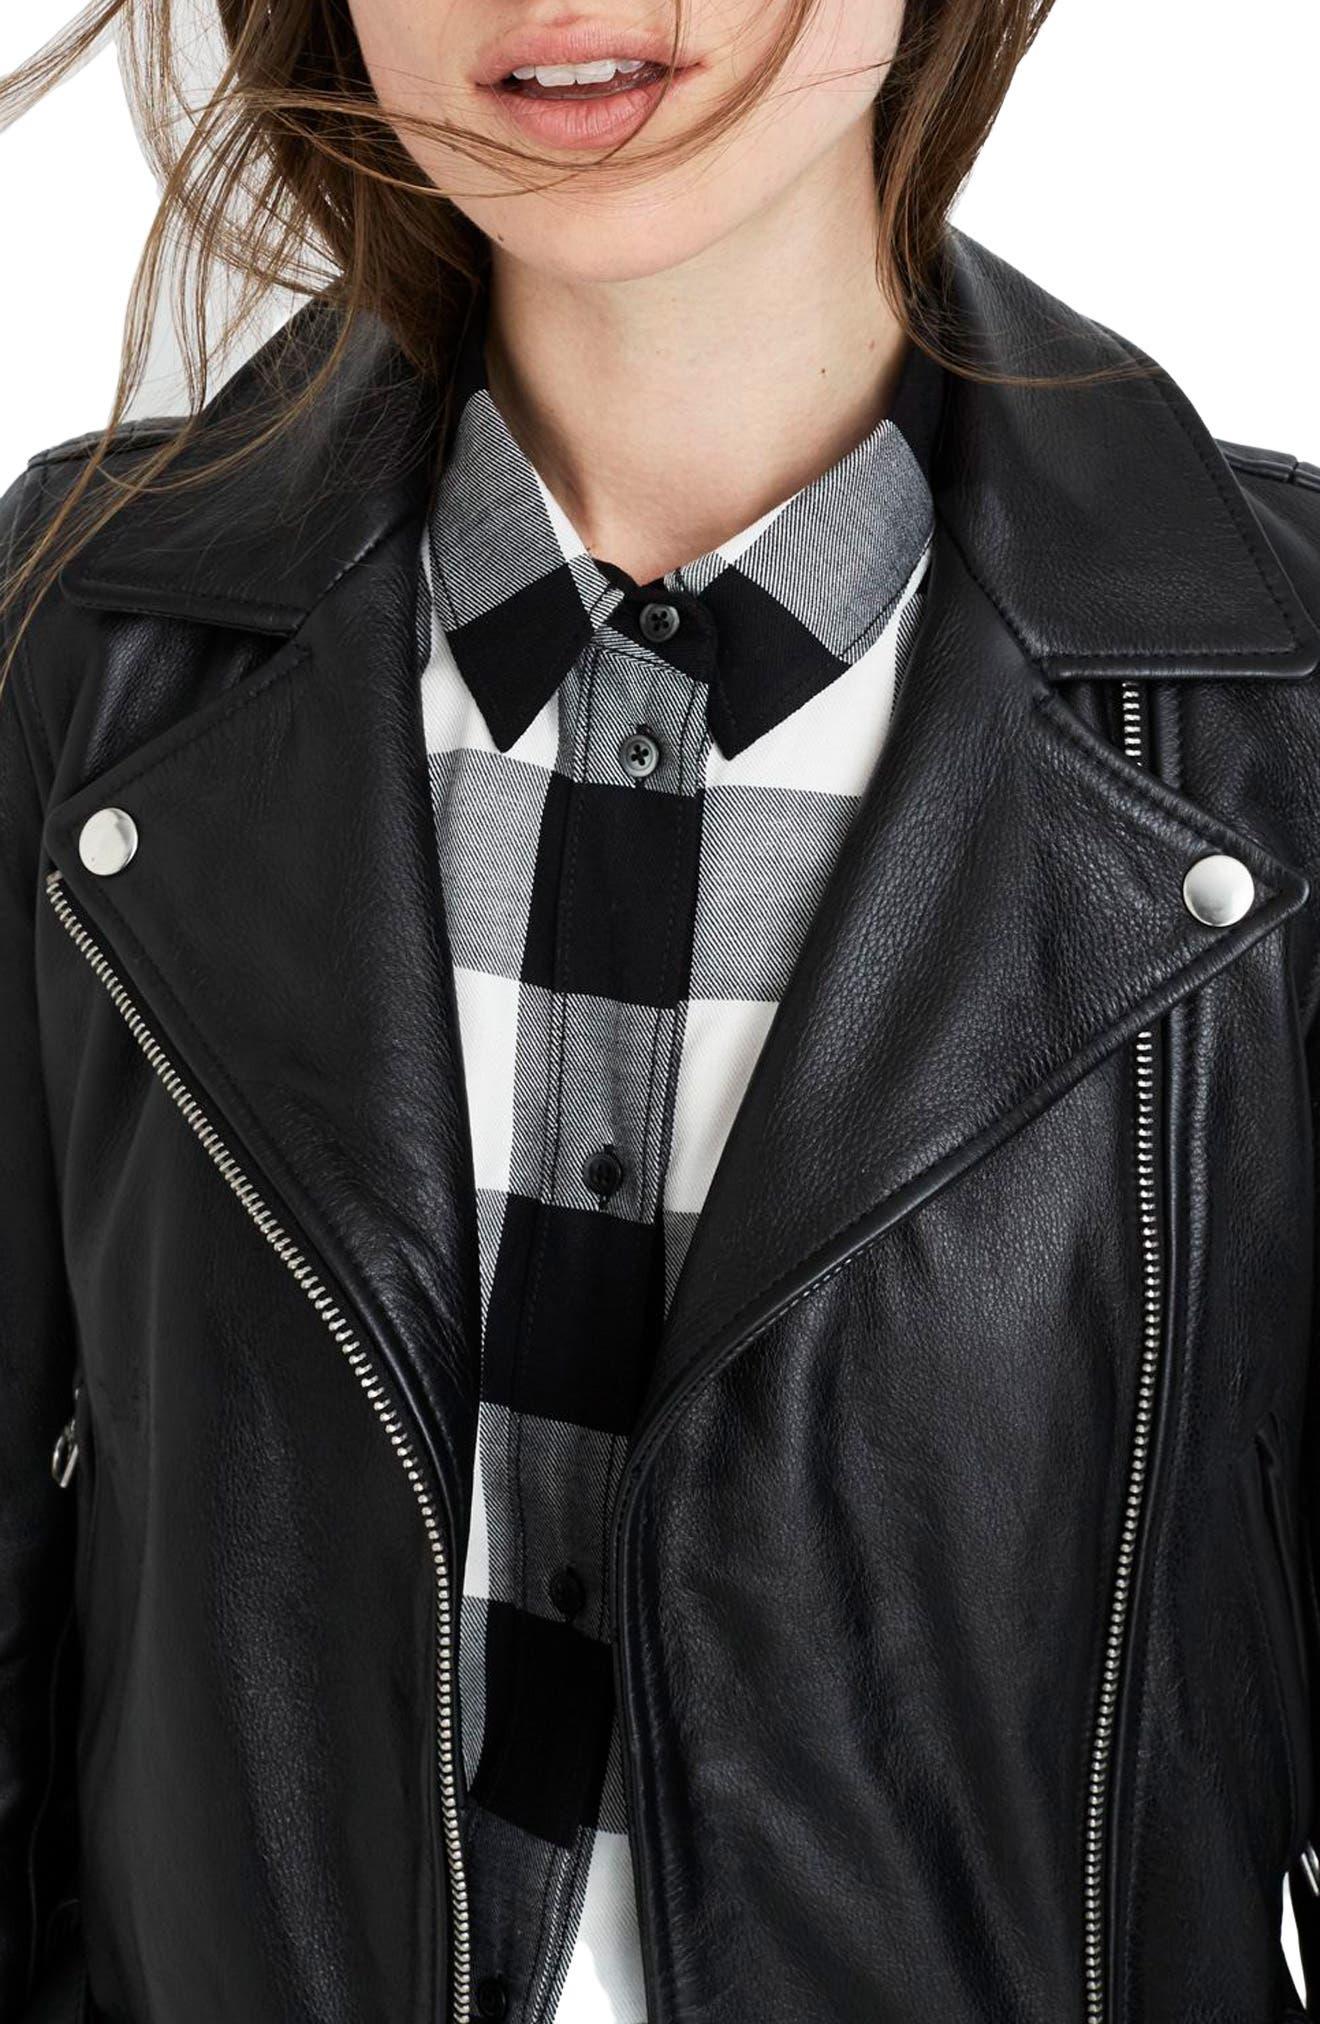 MADEWELL, Ultimate Leather Jacket, Alternate thumbnail 3, color, TRUE BLACK